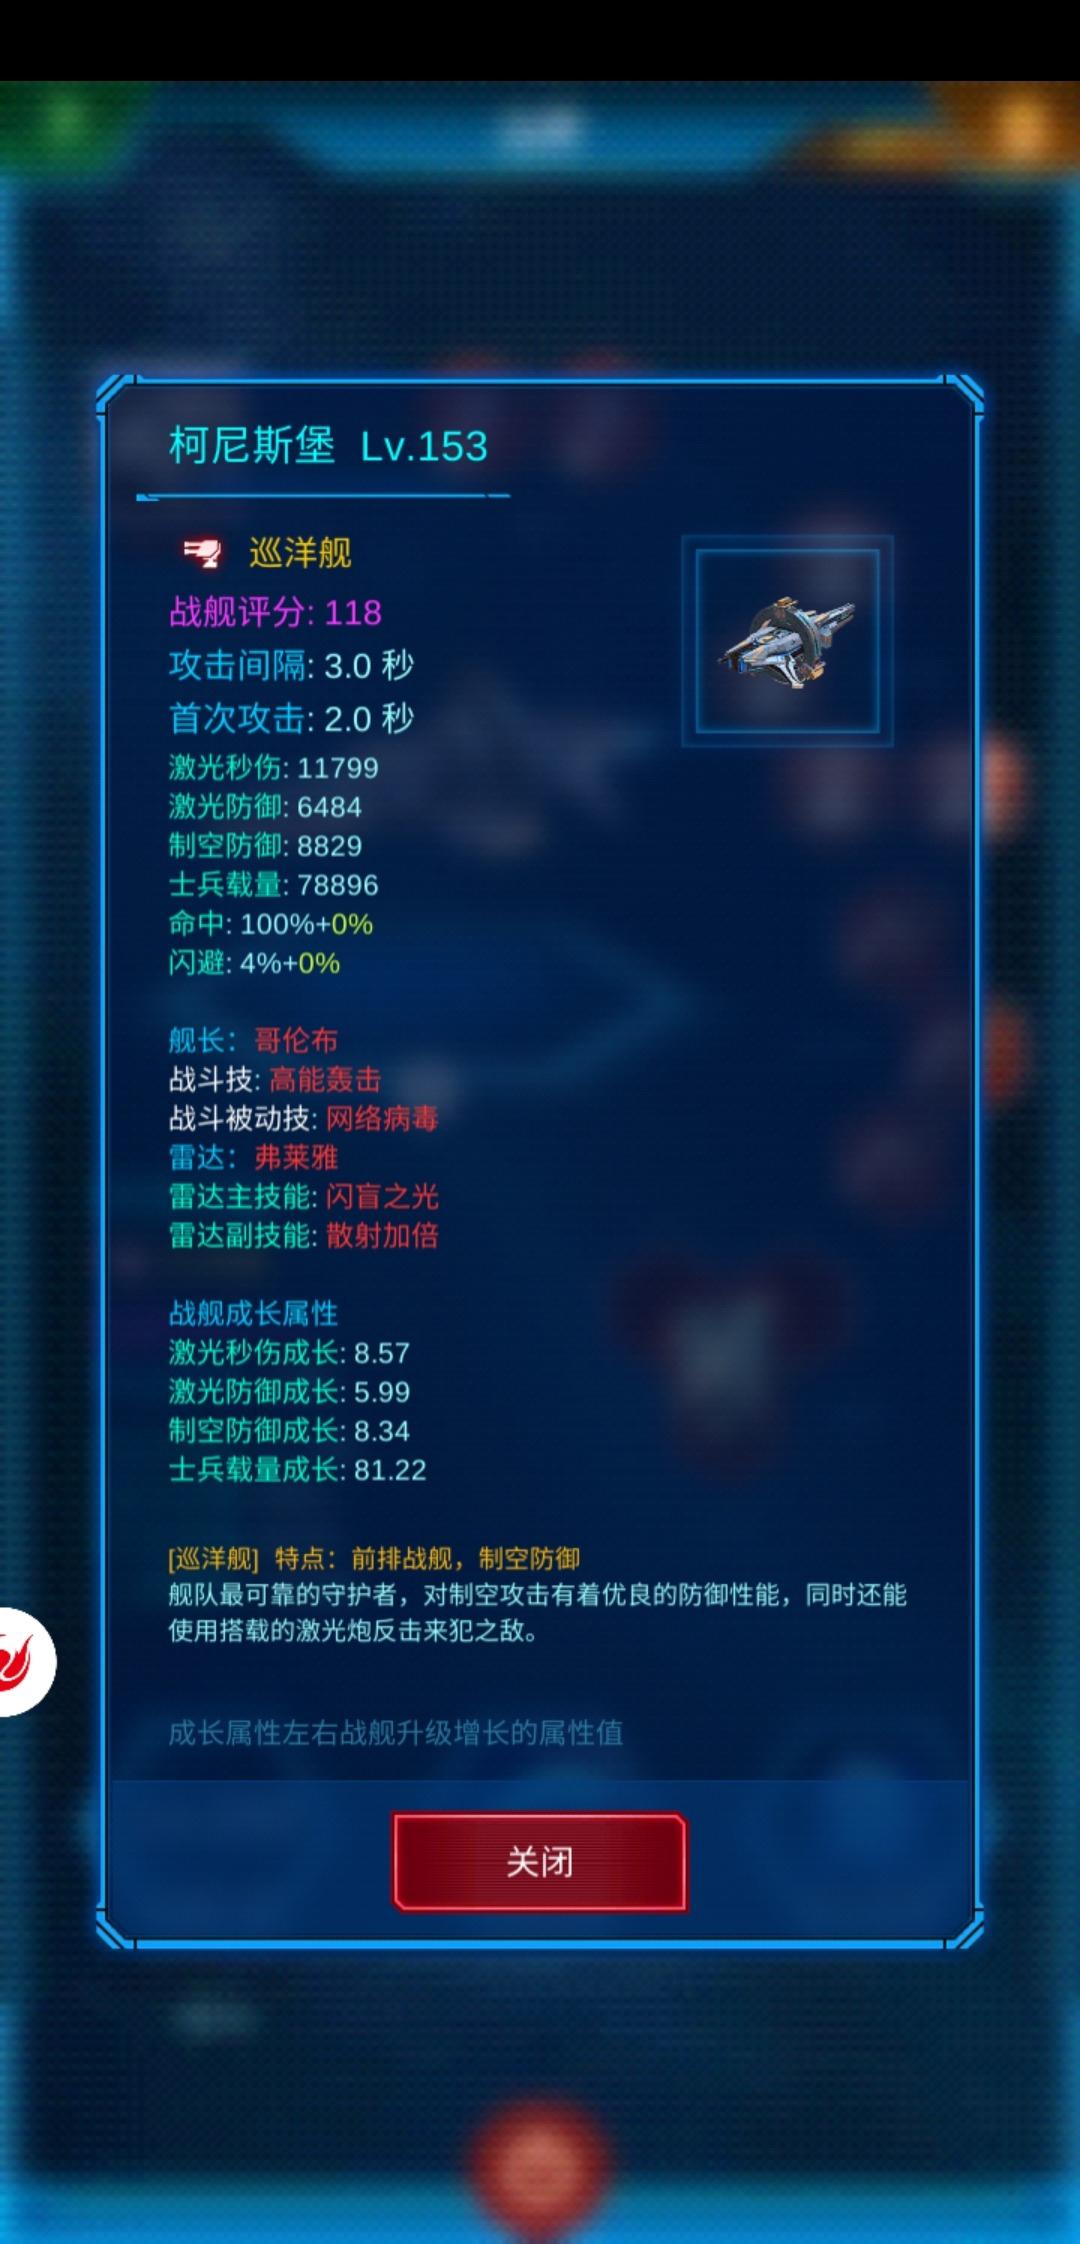 Screenshot_20200323_103943_com.jedigames.p16s.luobo.jpg